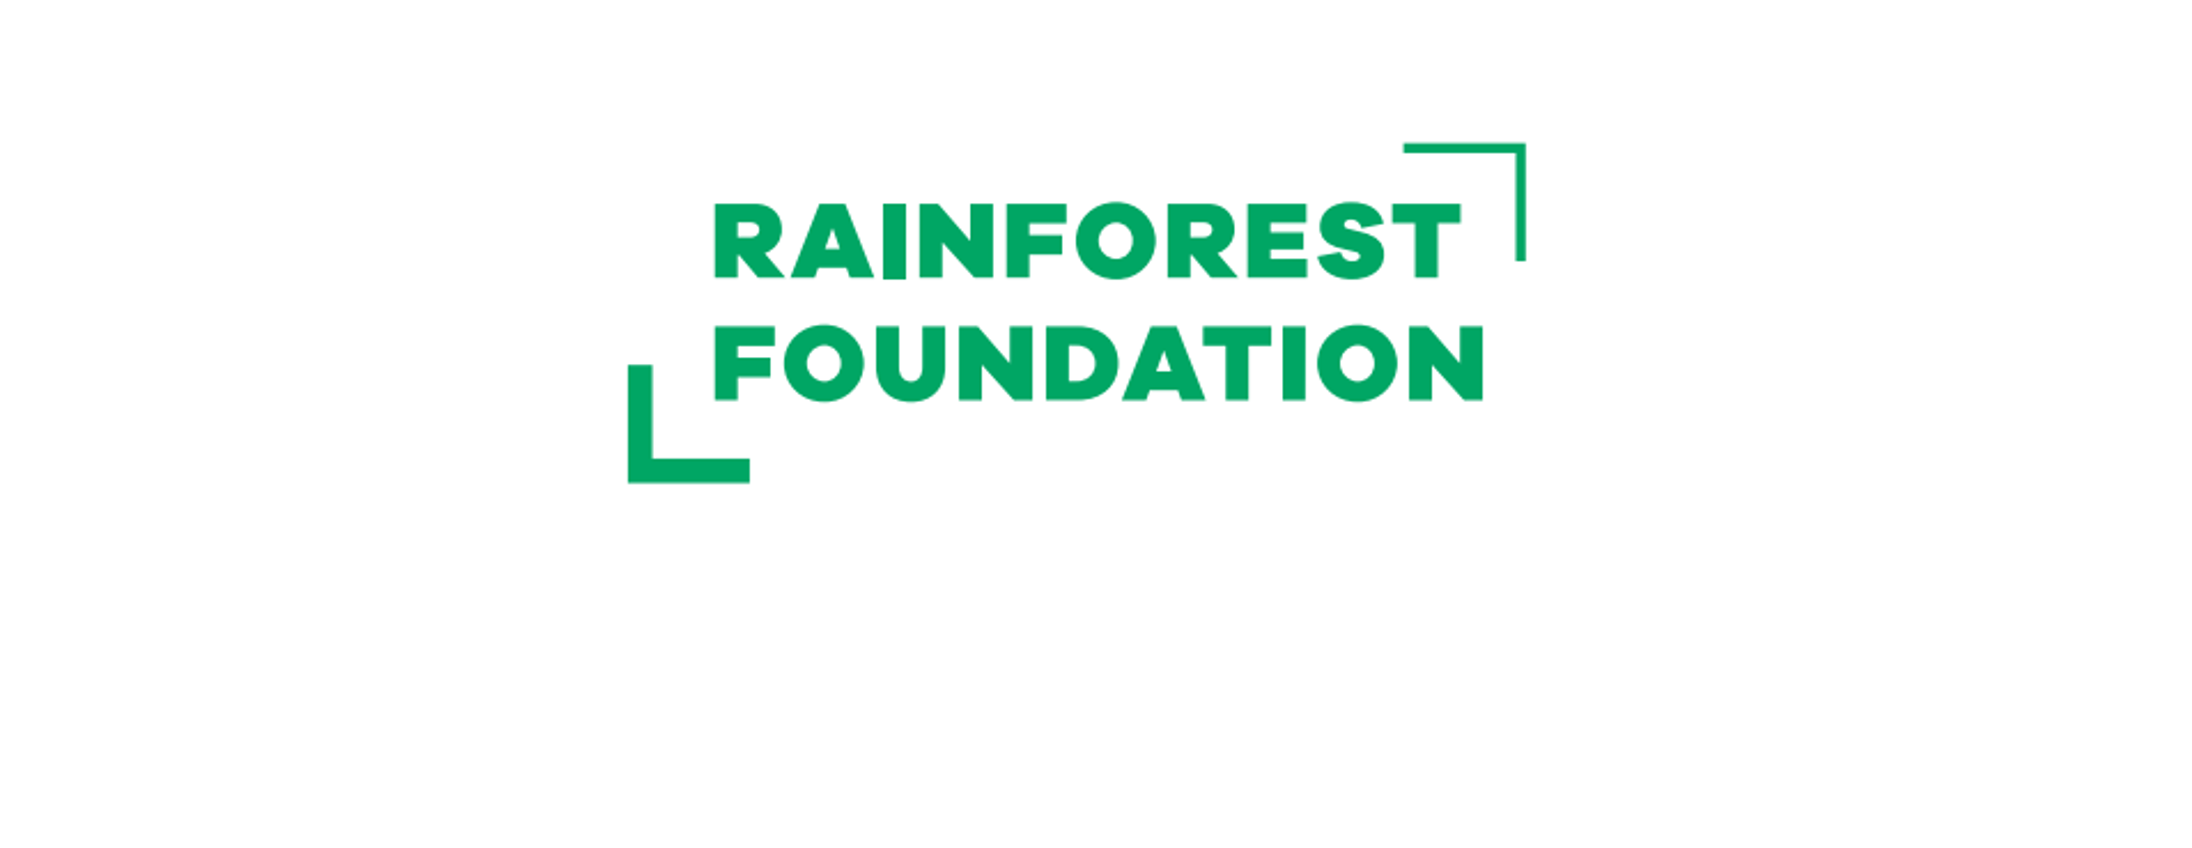 Rainforest Foundation Logo